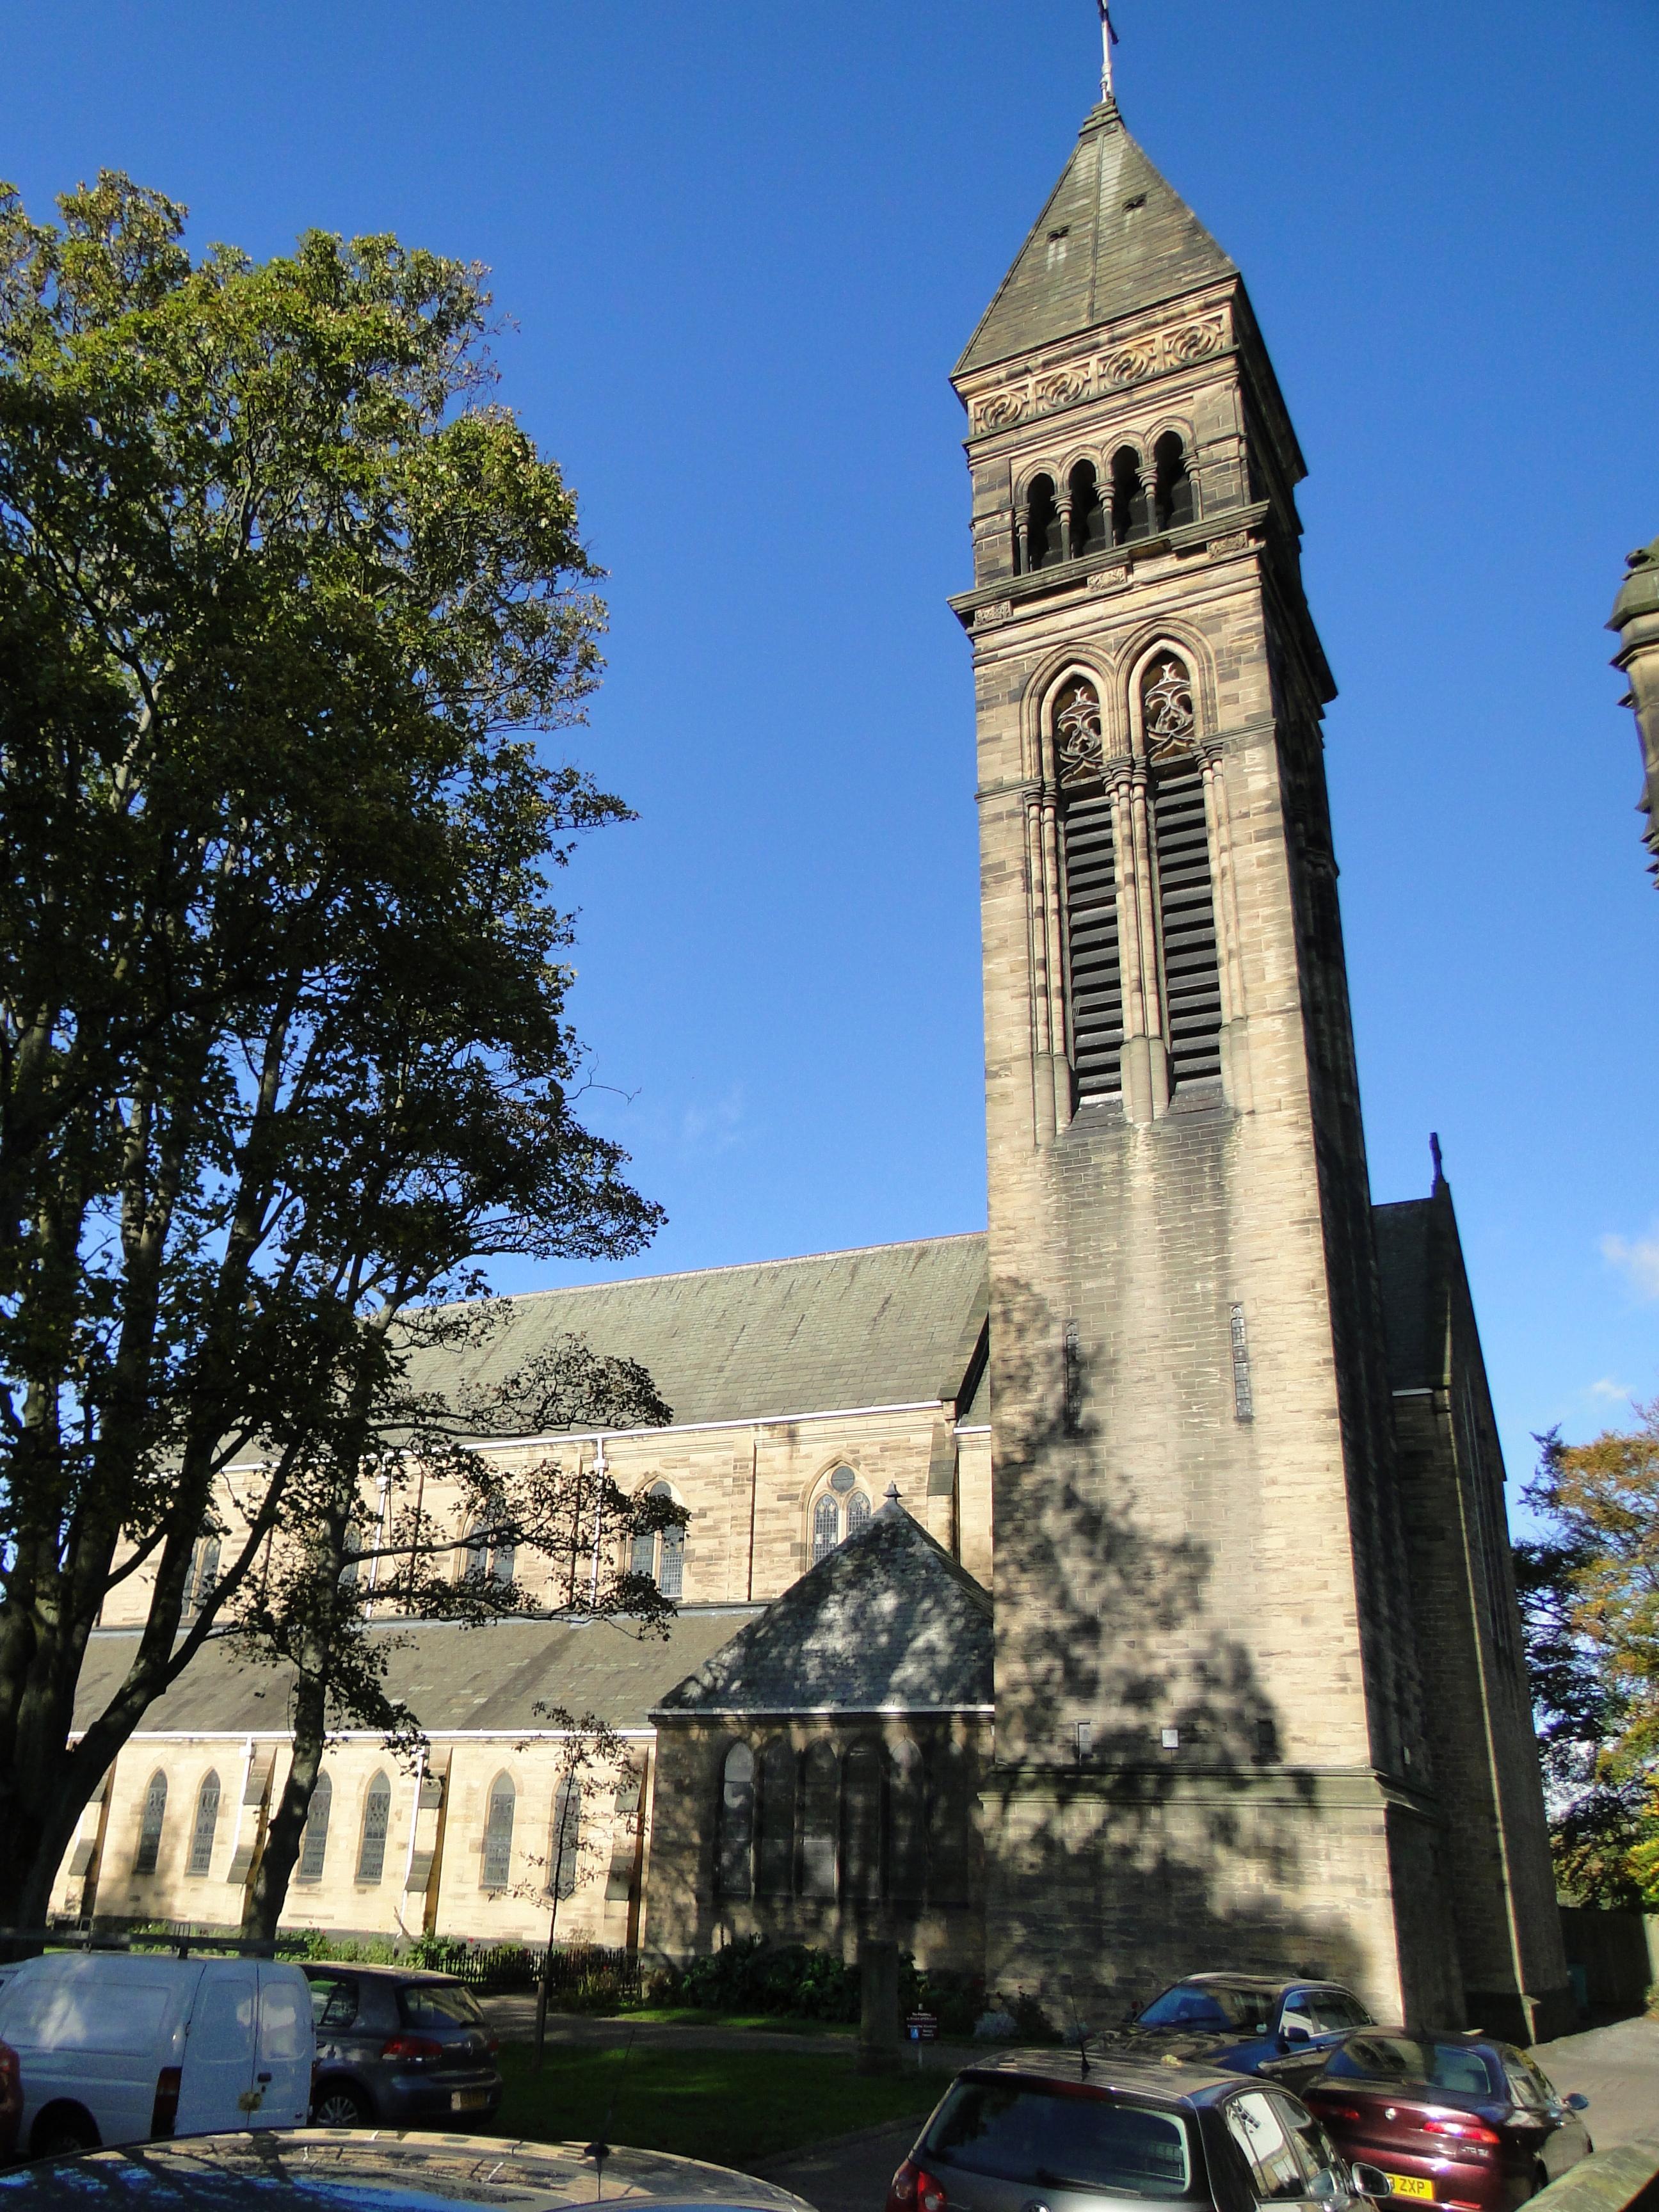 The Clog Almanac of St Georges Church, Jesmond